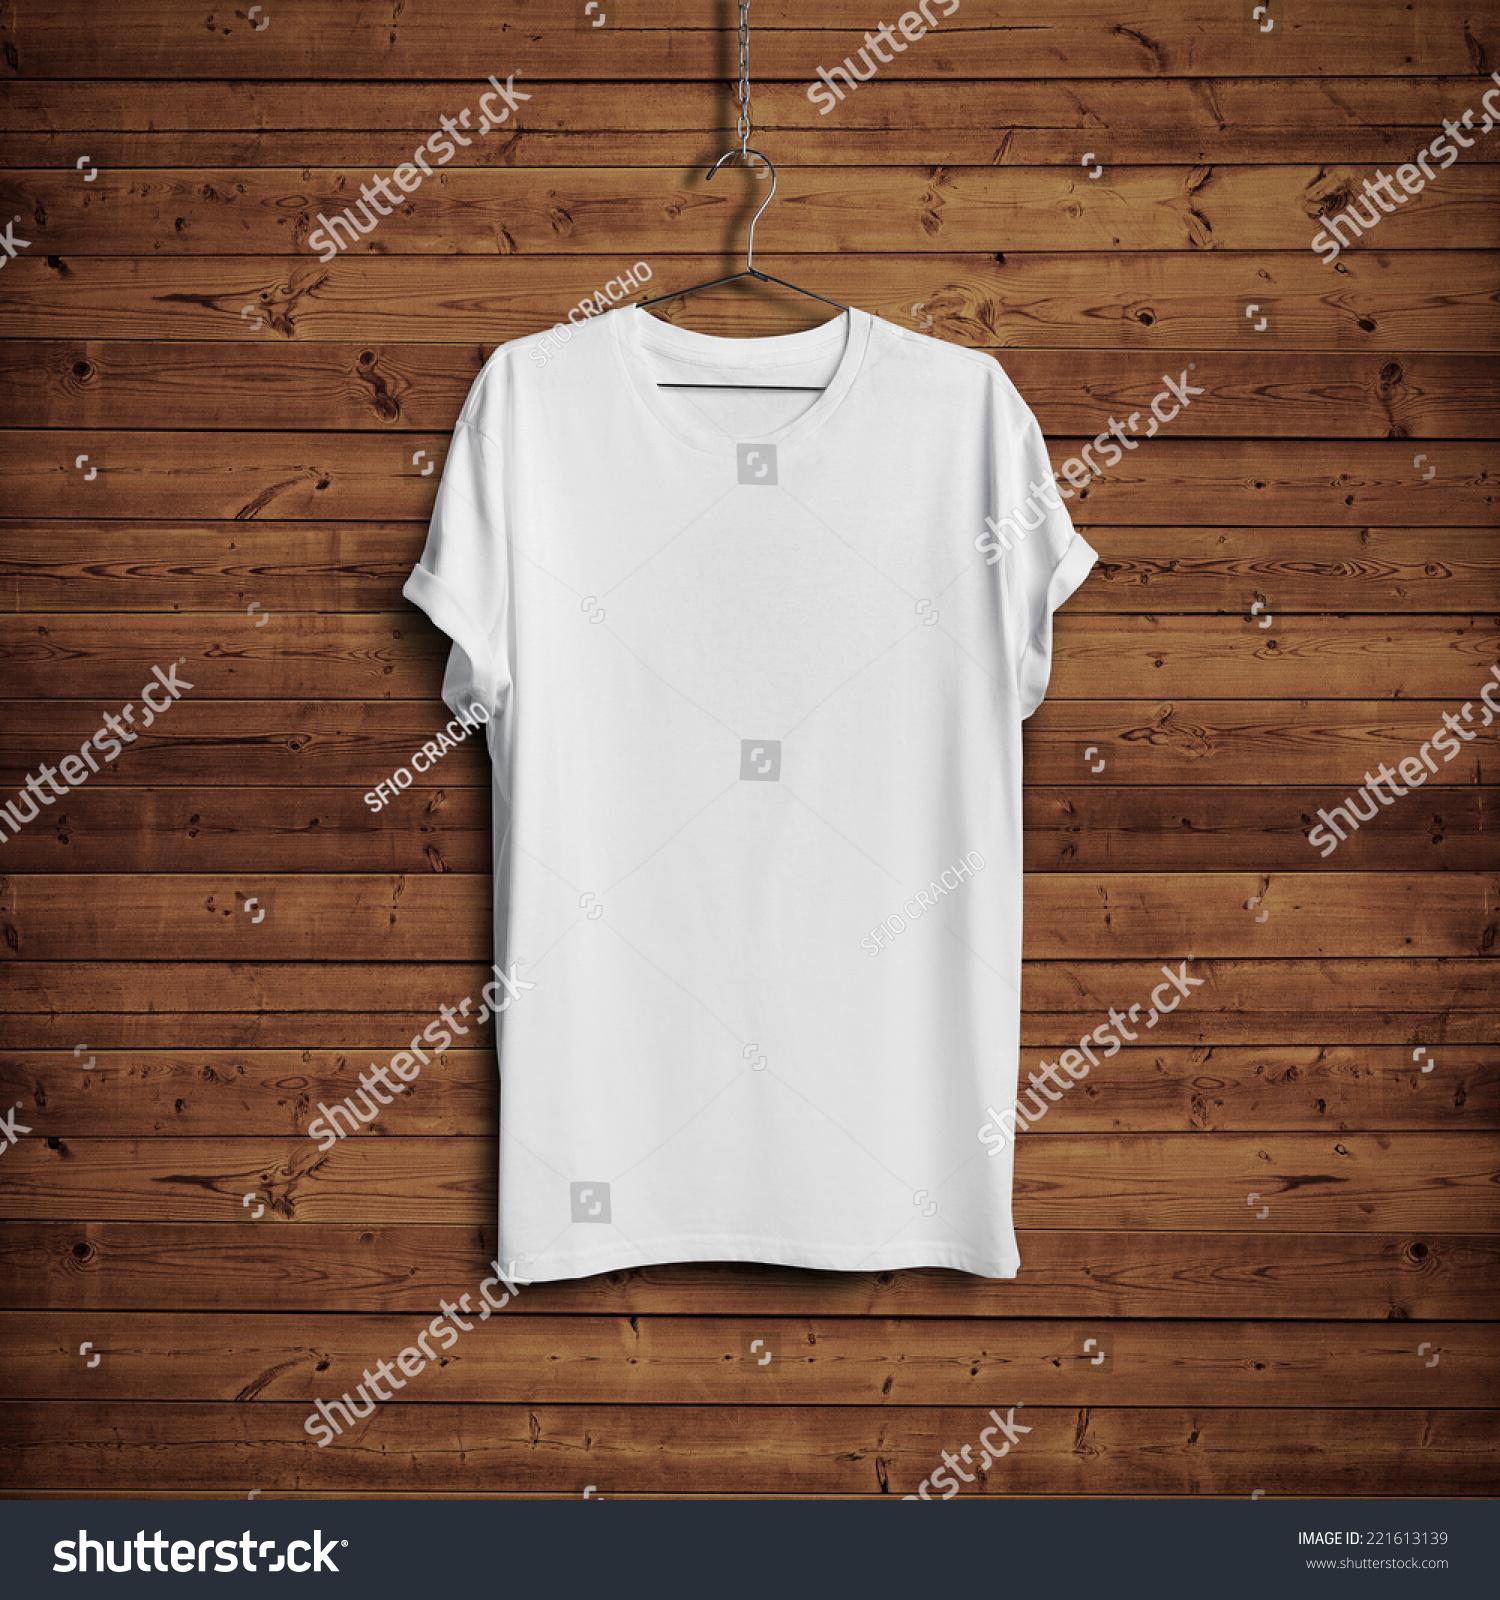 T shirt white blank - White Blank T Shirt On Dark Wood Wall